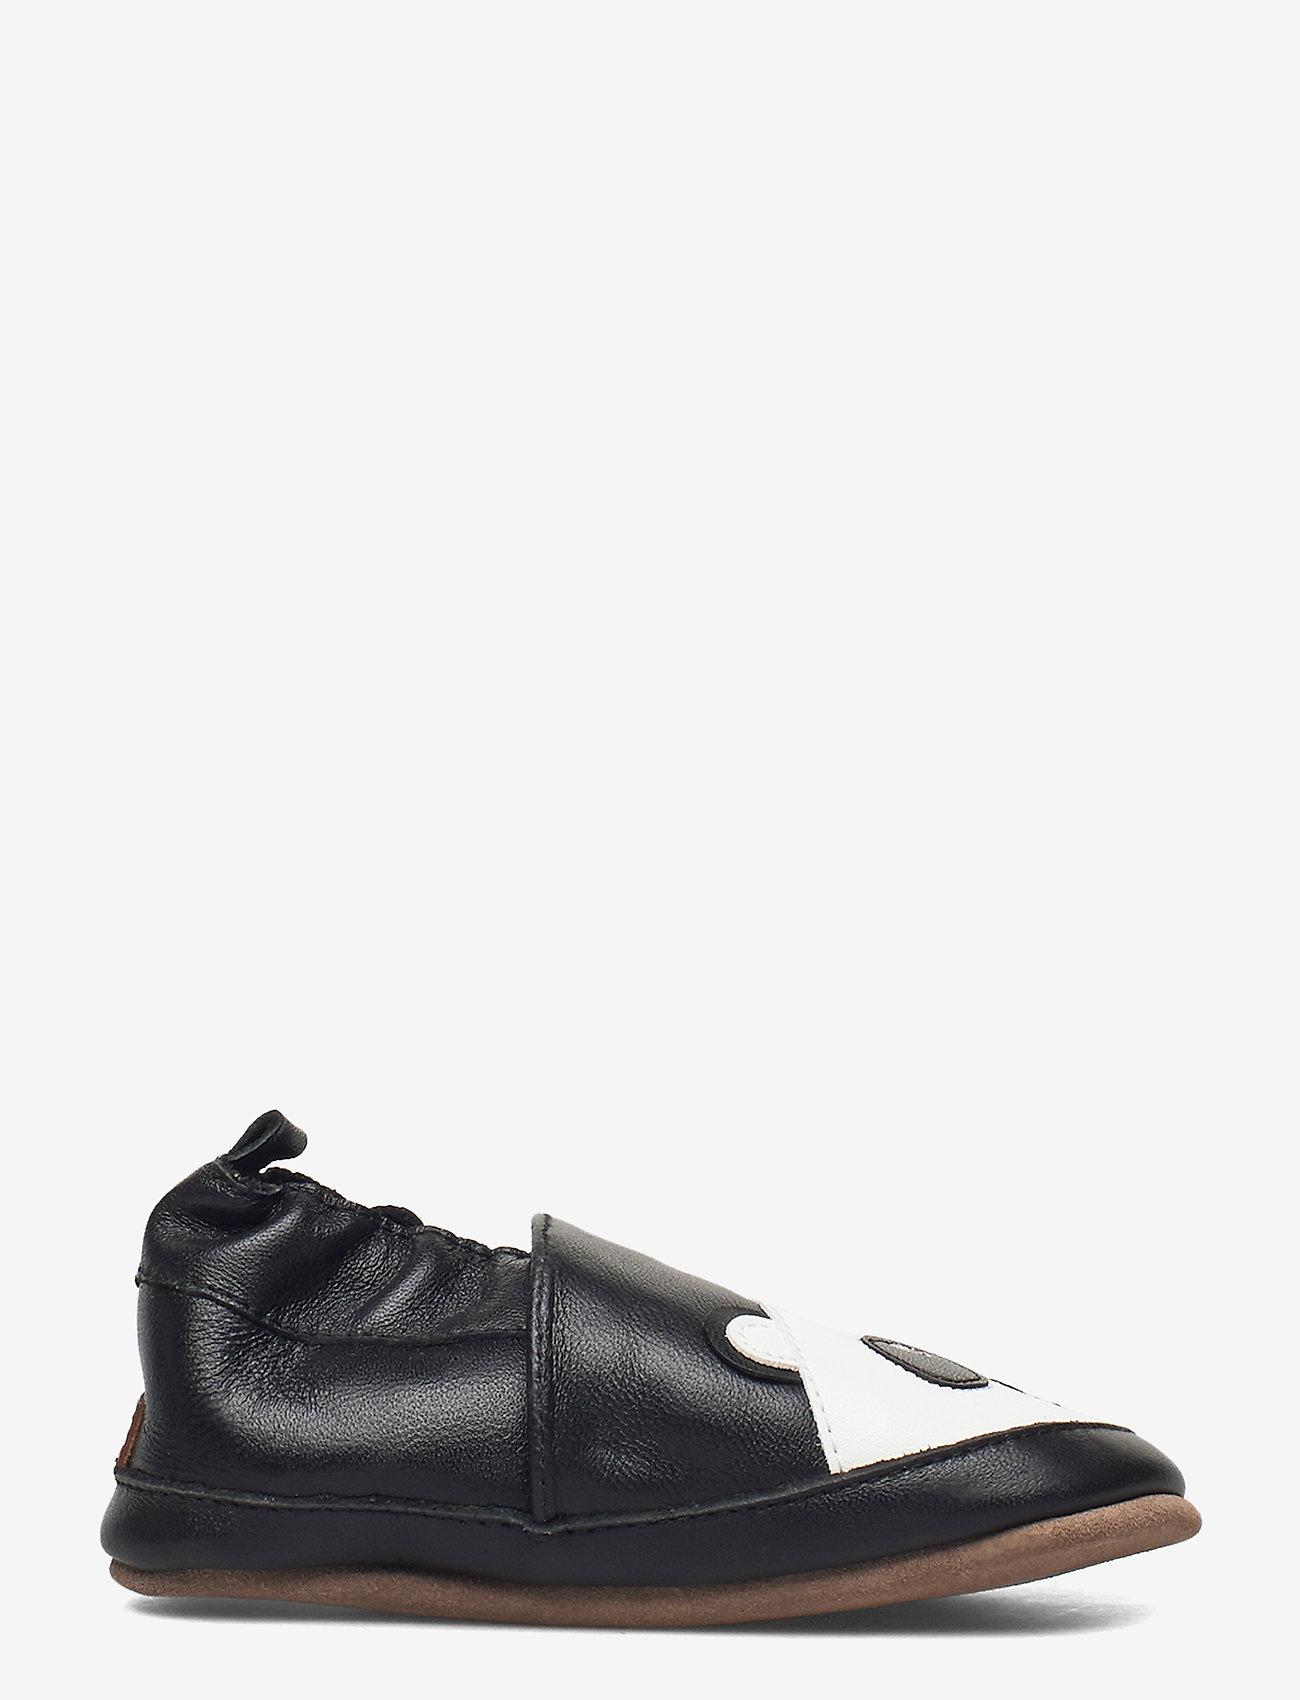 Melton - Leather Shoe - Panda - schuhe - black - 1